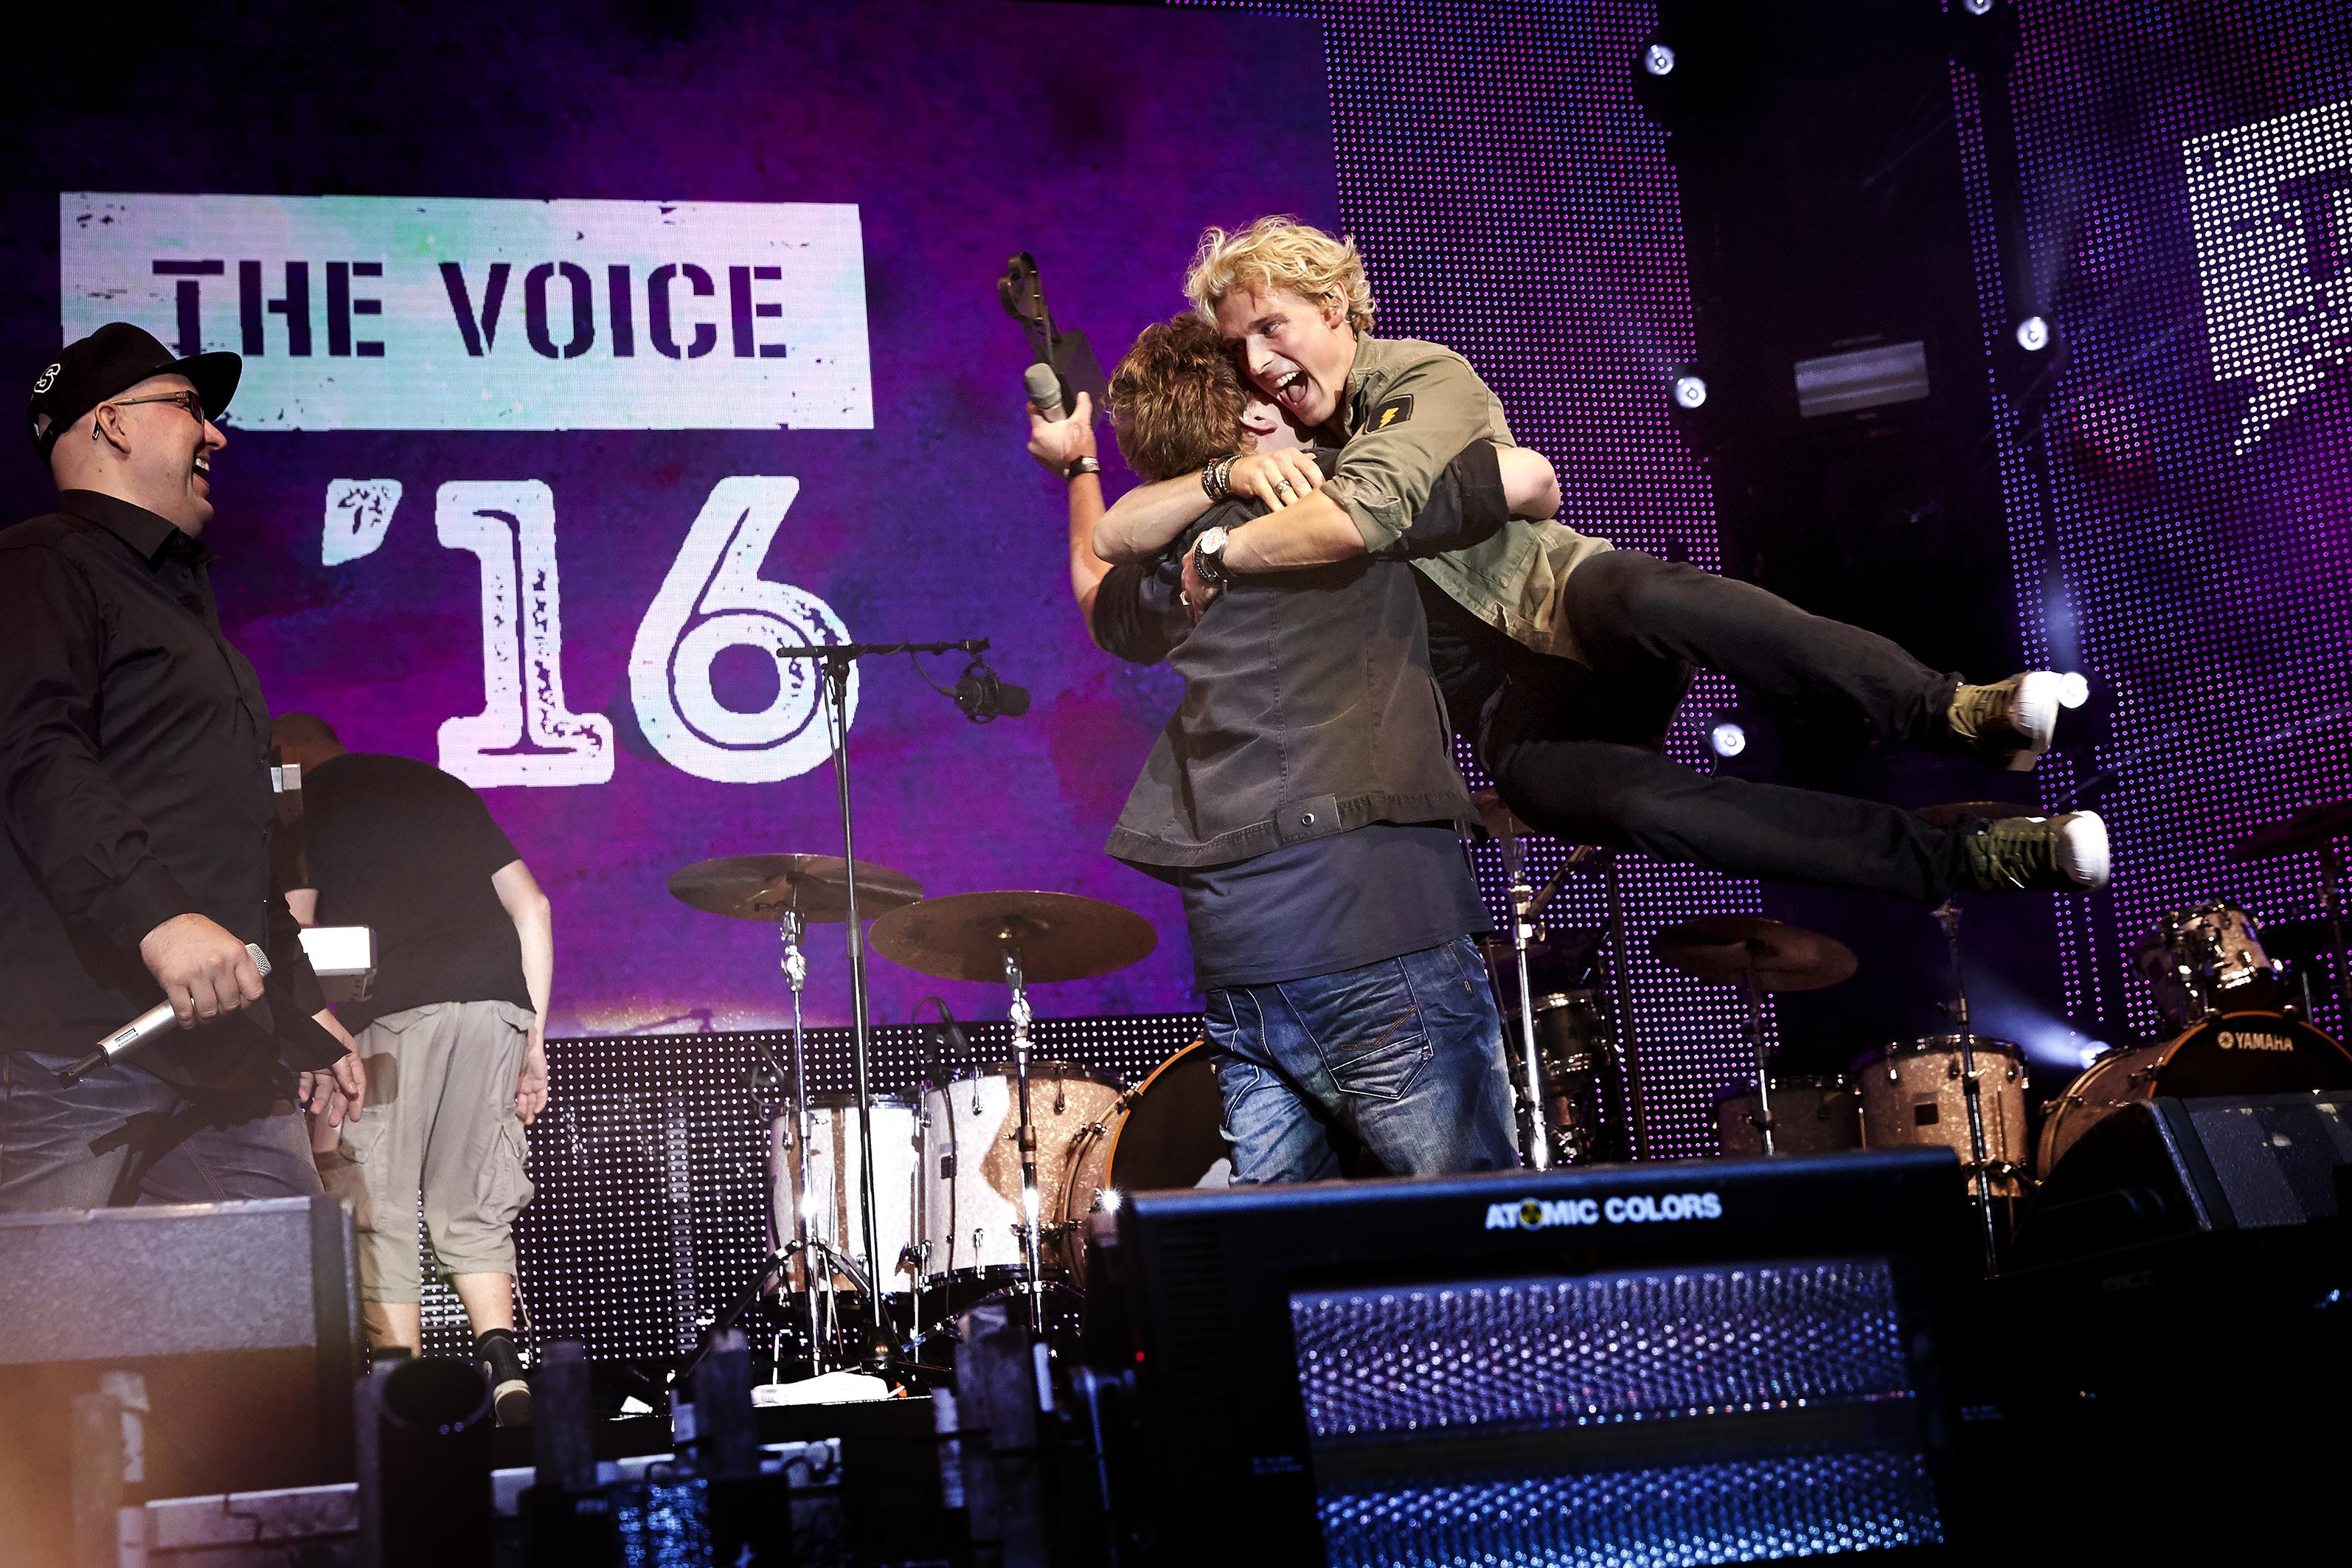 The Voice '16 lagdeTivoli ned